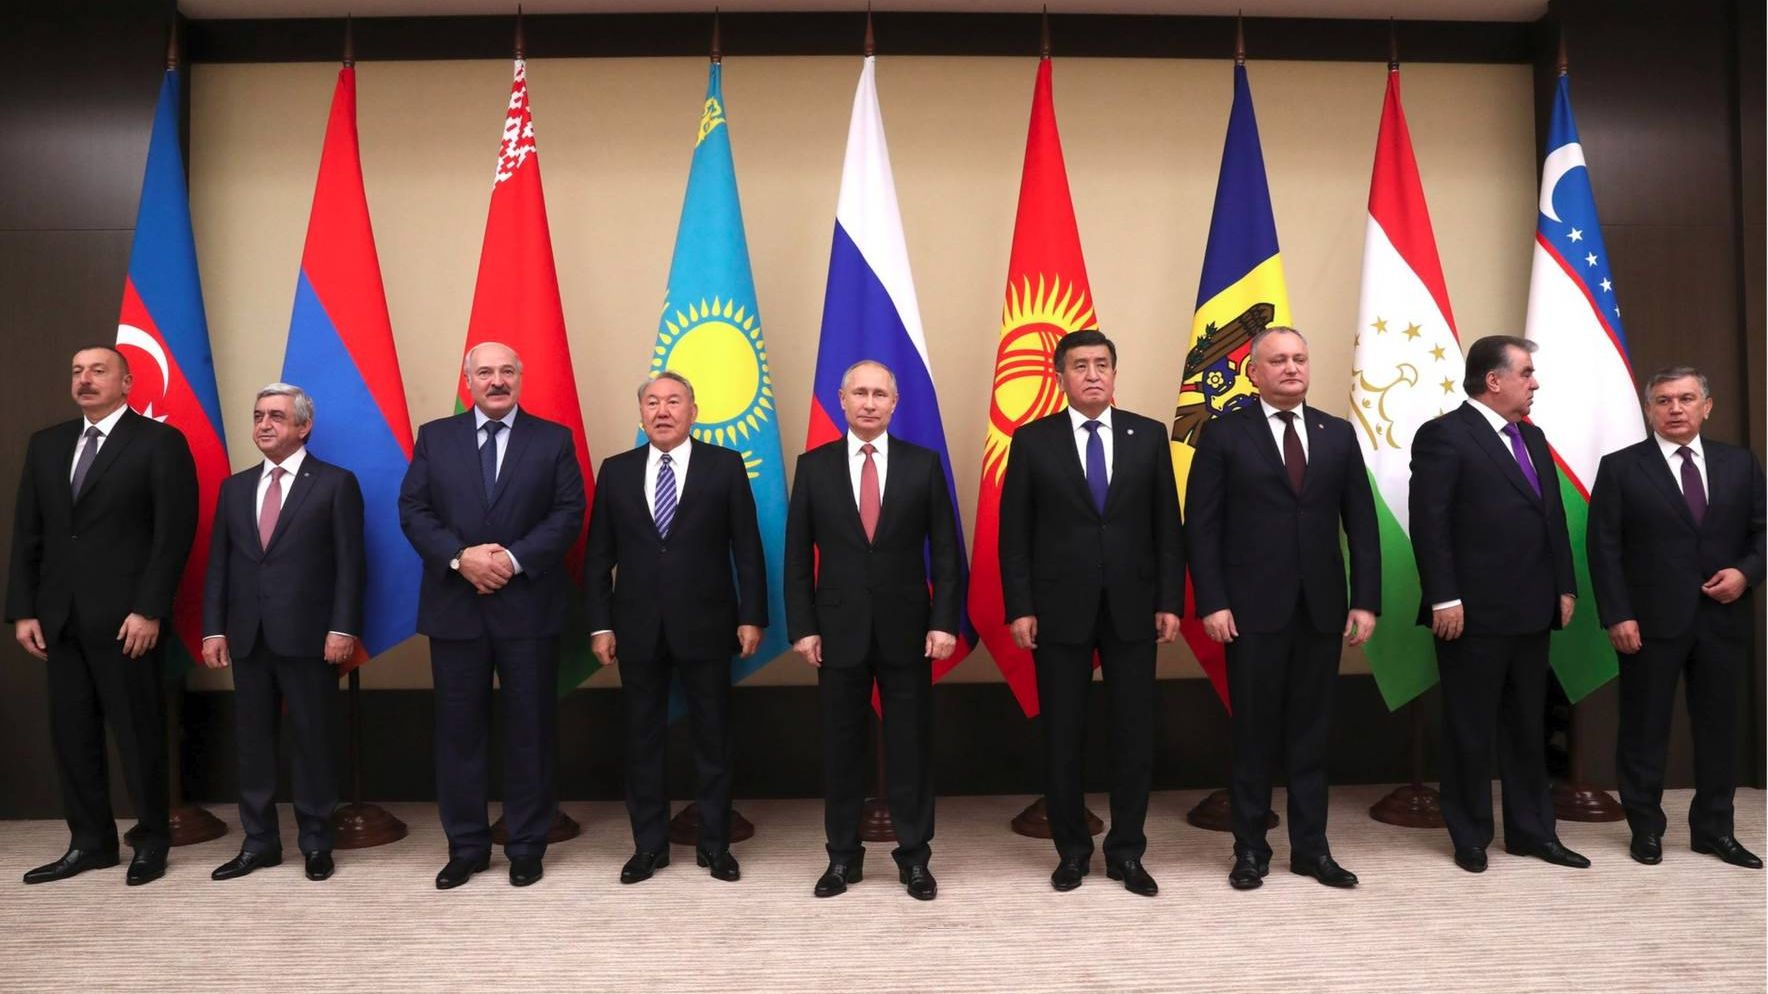 Встреча глав стран СНГ